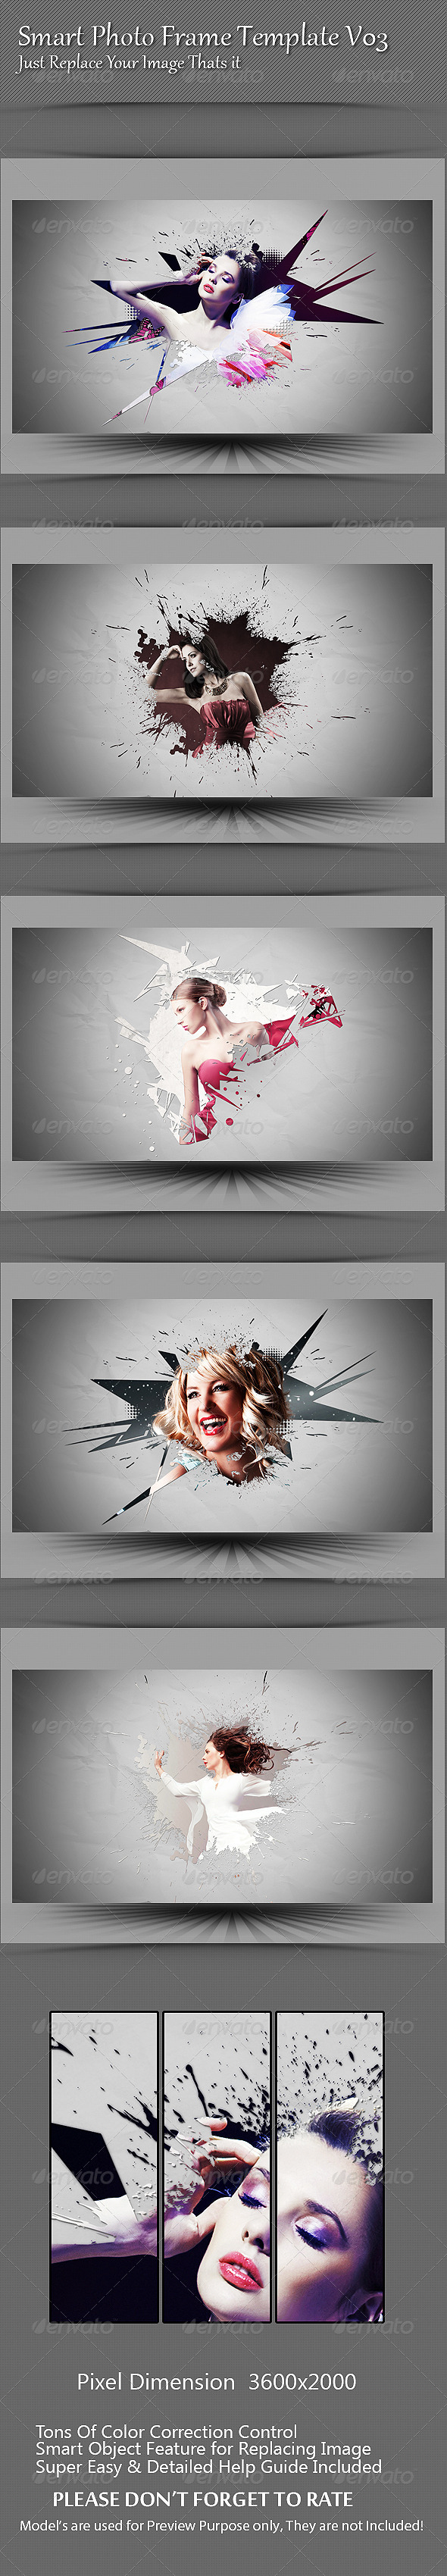 Smart Photo Frame Template V03